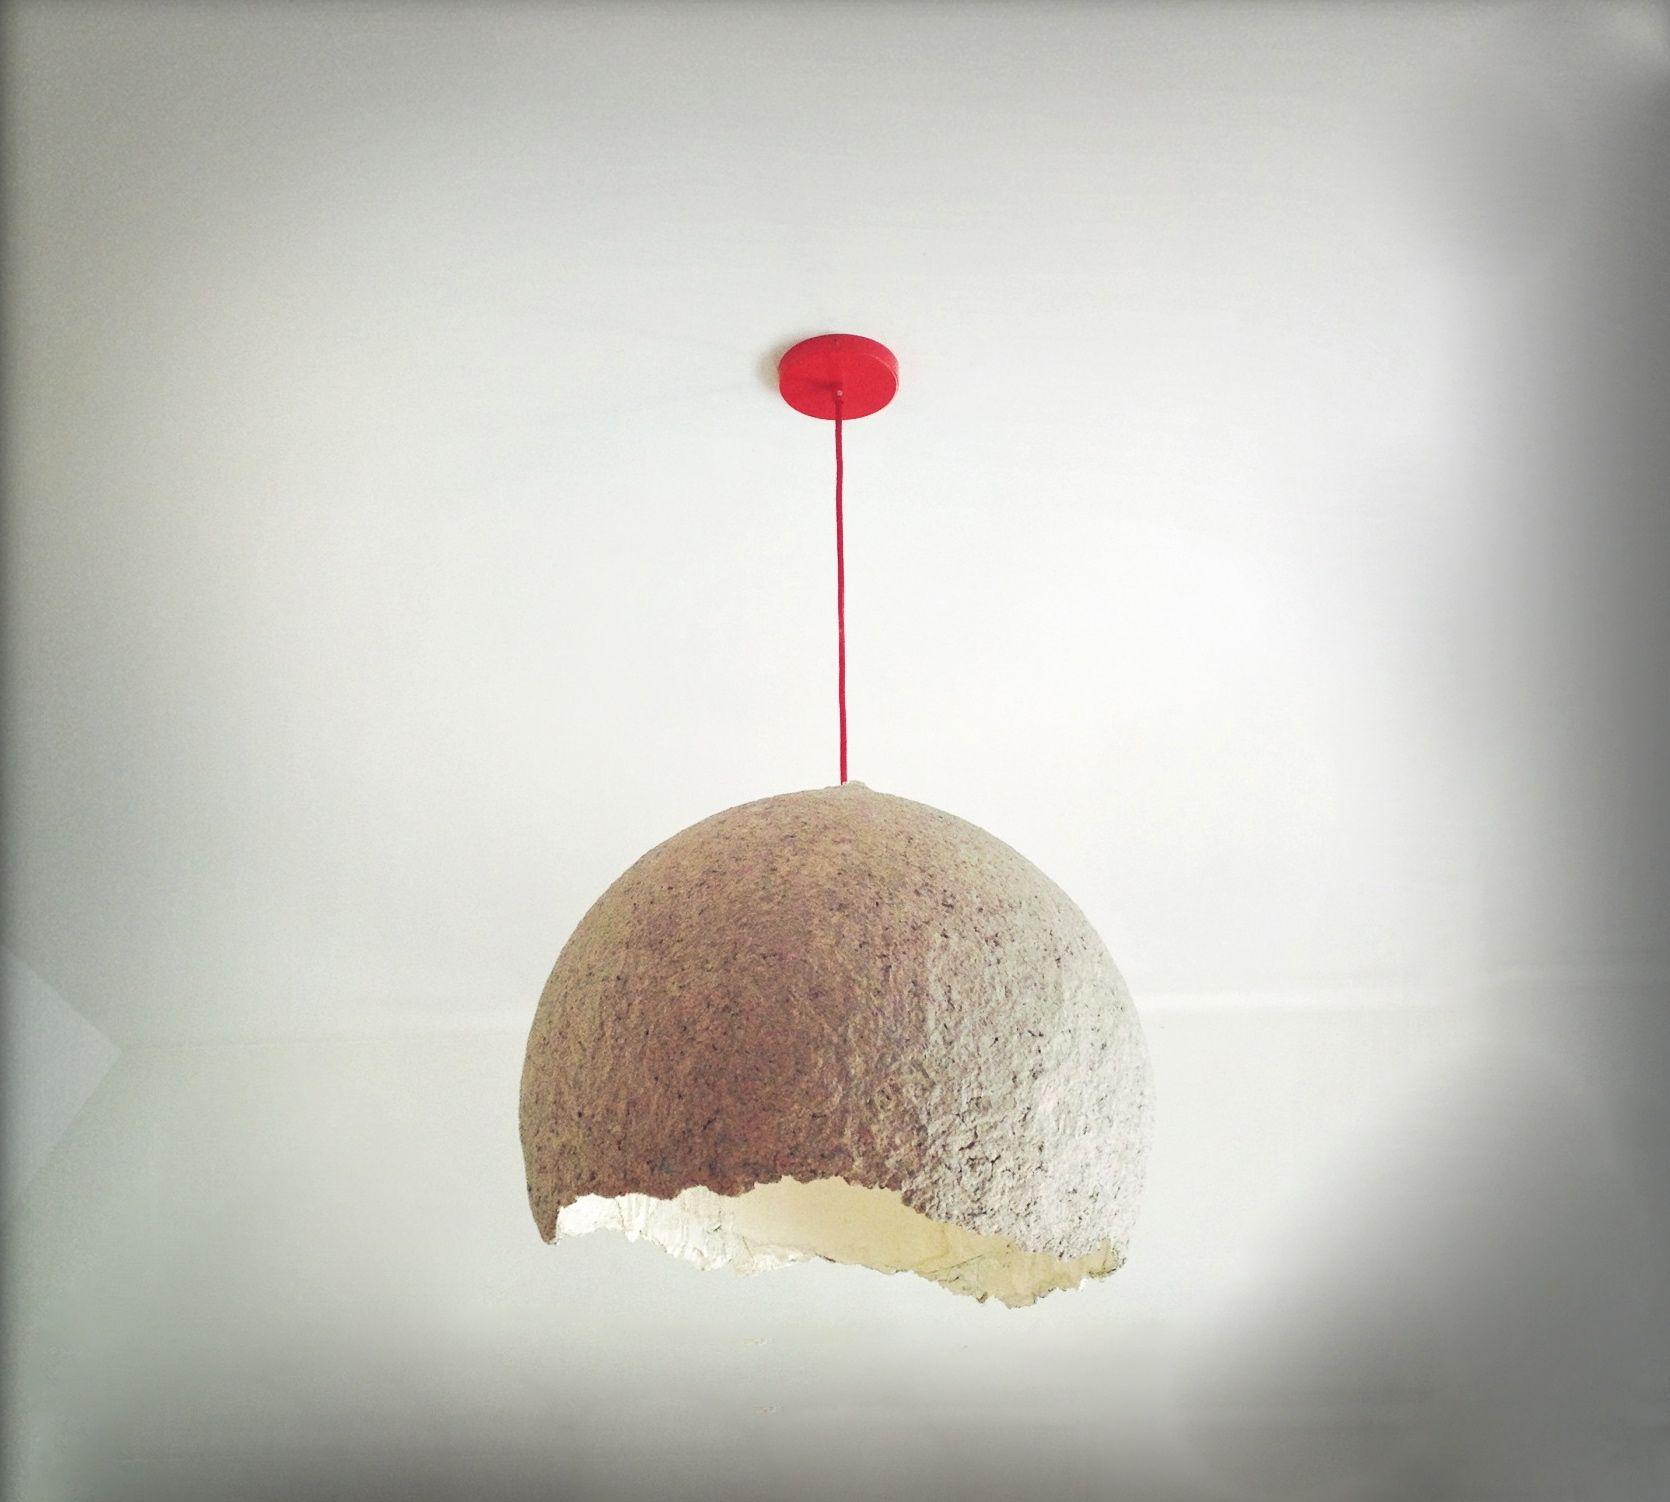 Diy How To Make A Paper Mache Lamp Lamparas De Papel Papel De Bricolaje Manualidades Con Globos